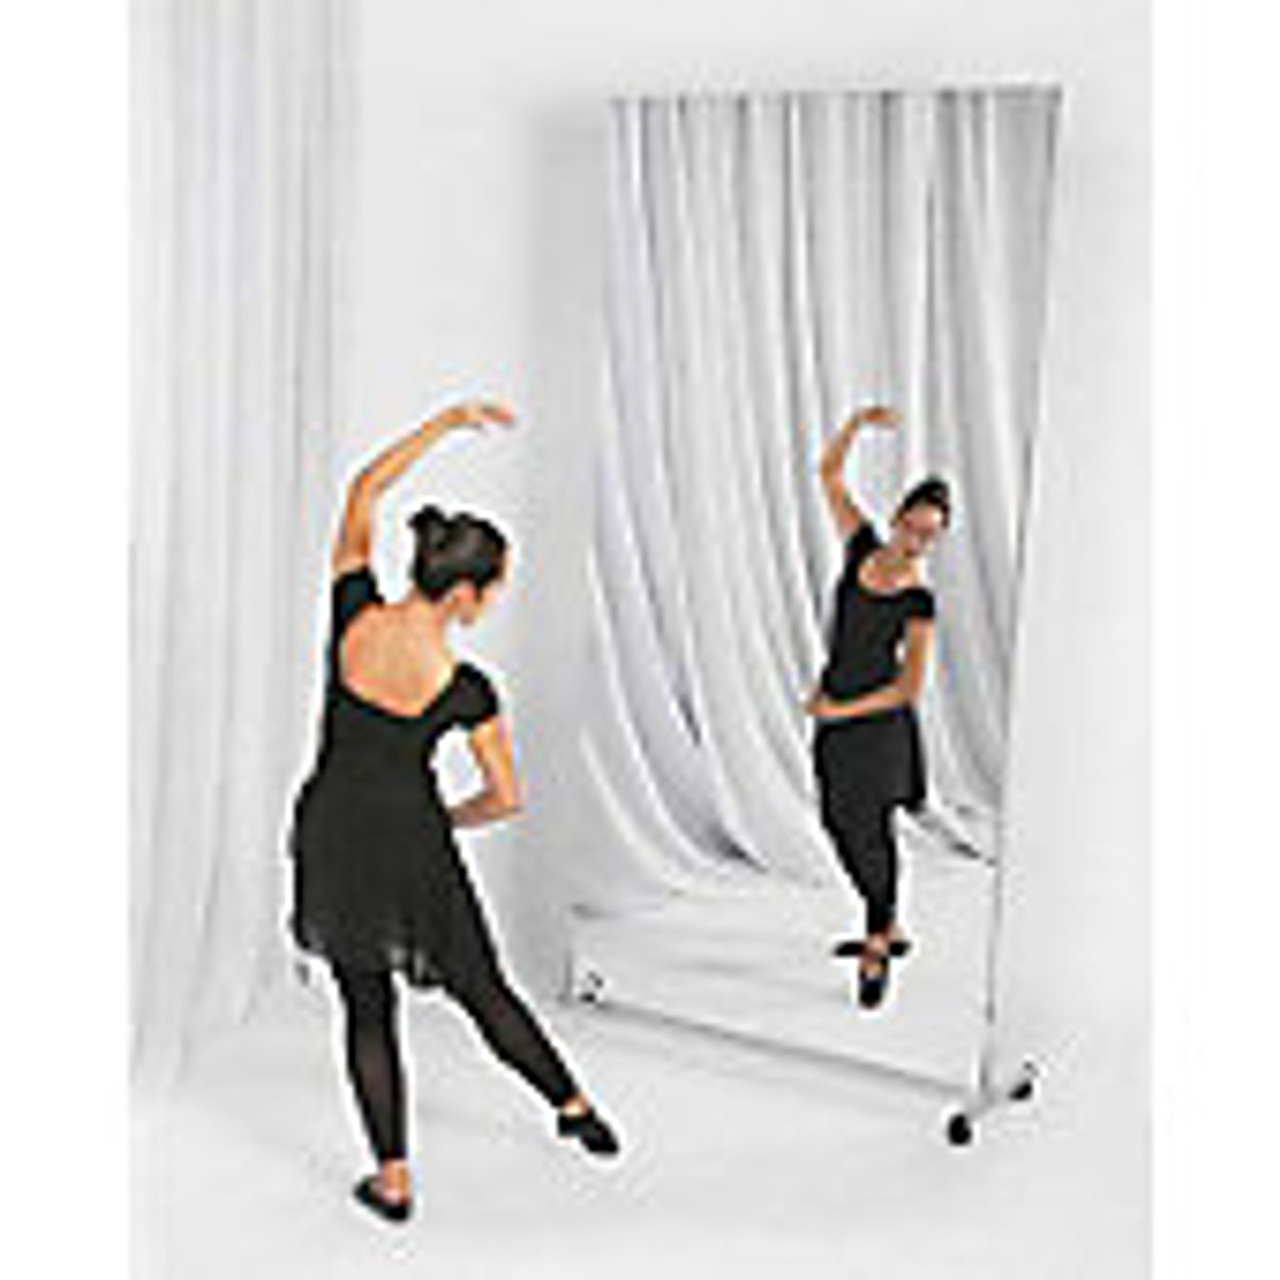 Glassless Mirror - 4' x 8' Acrylic Mirror